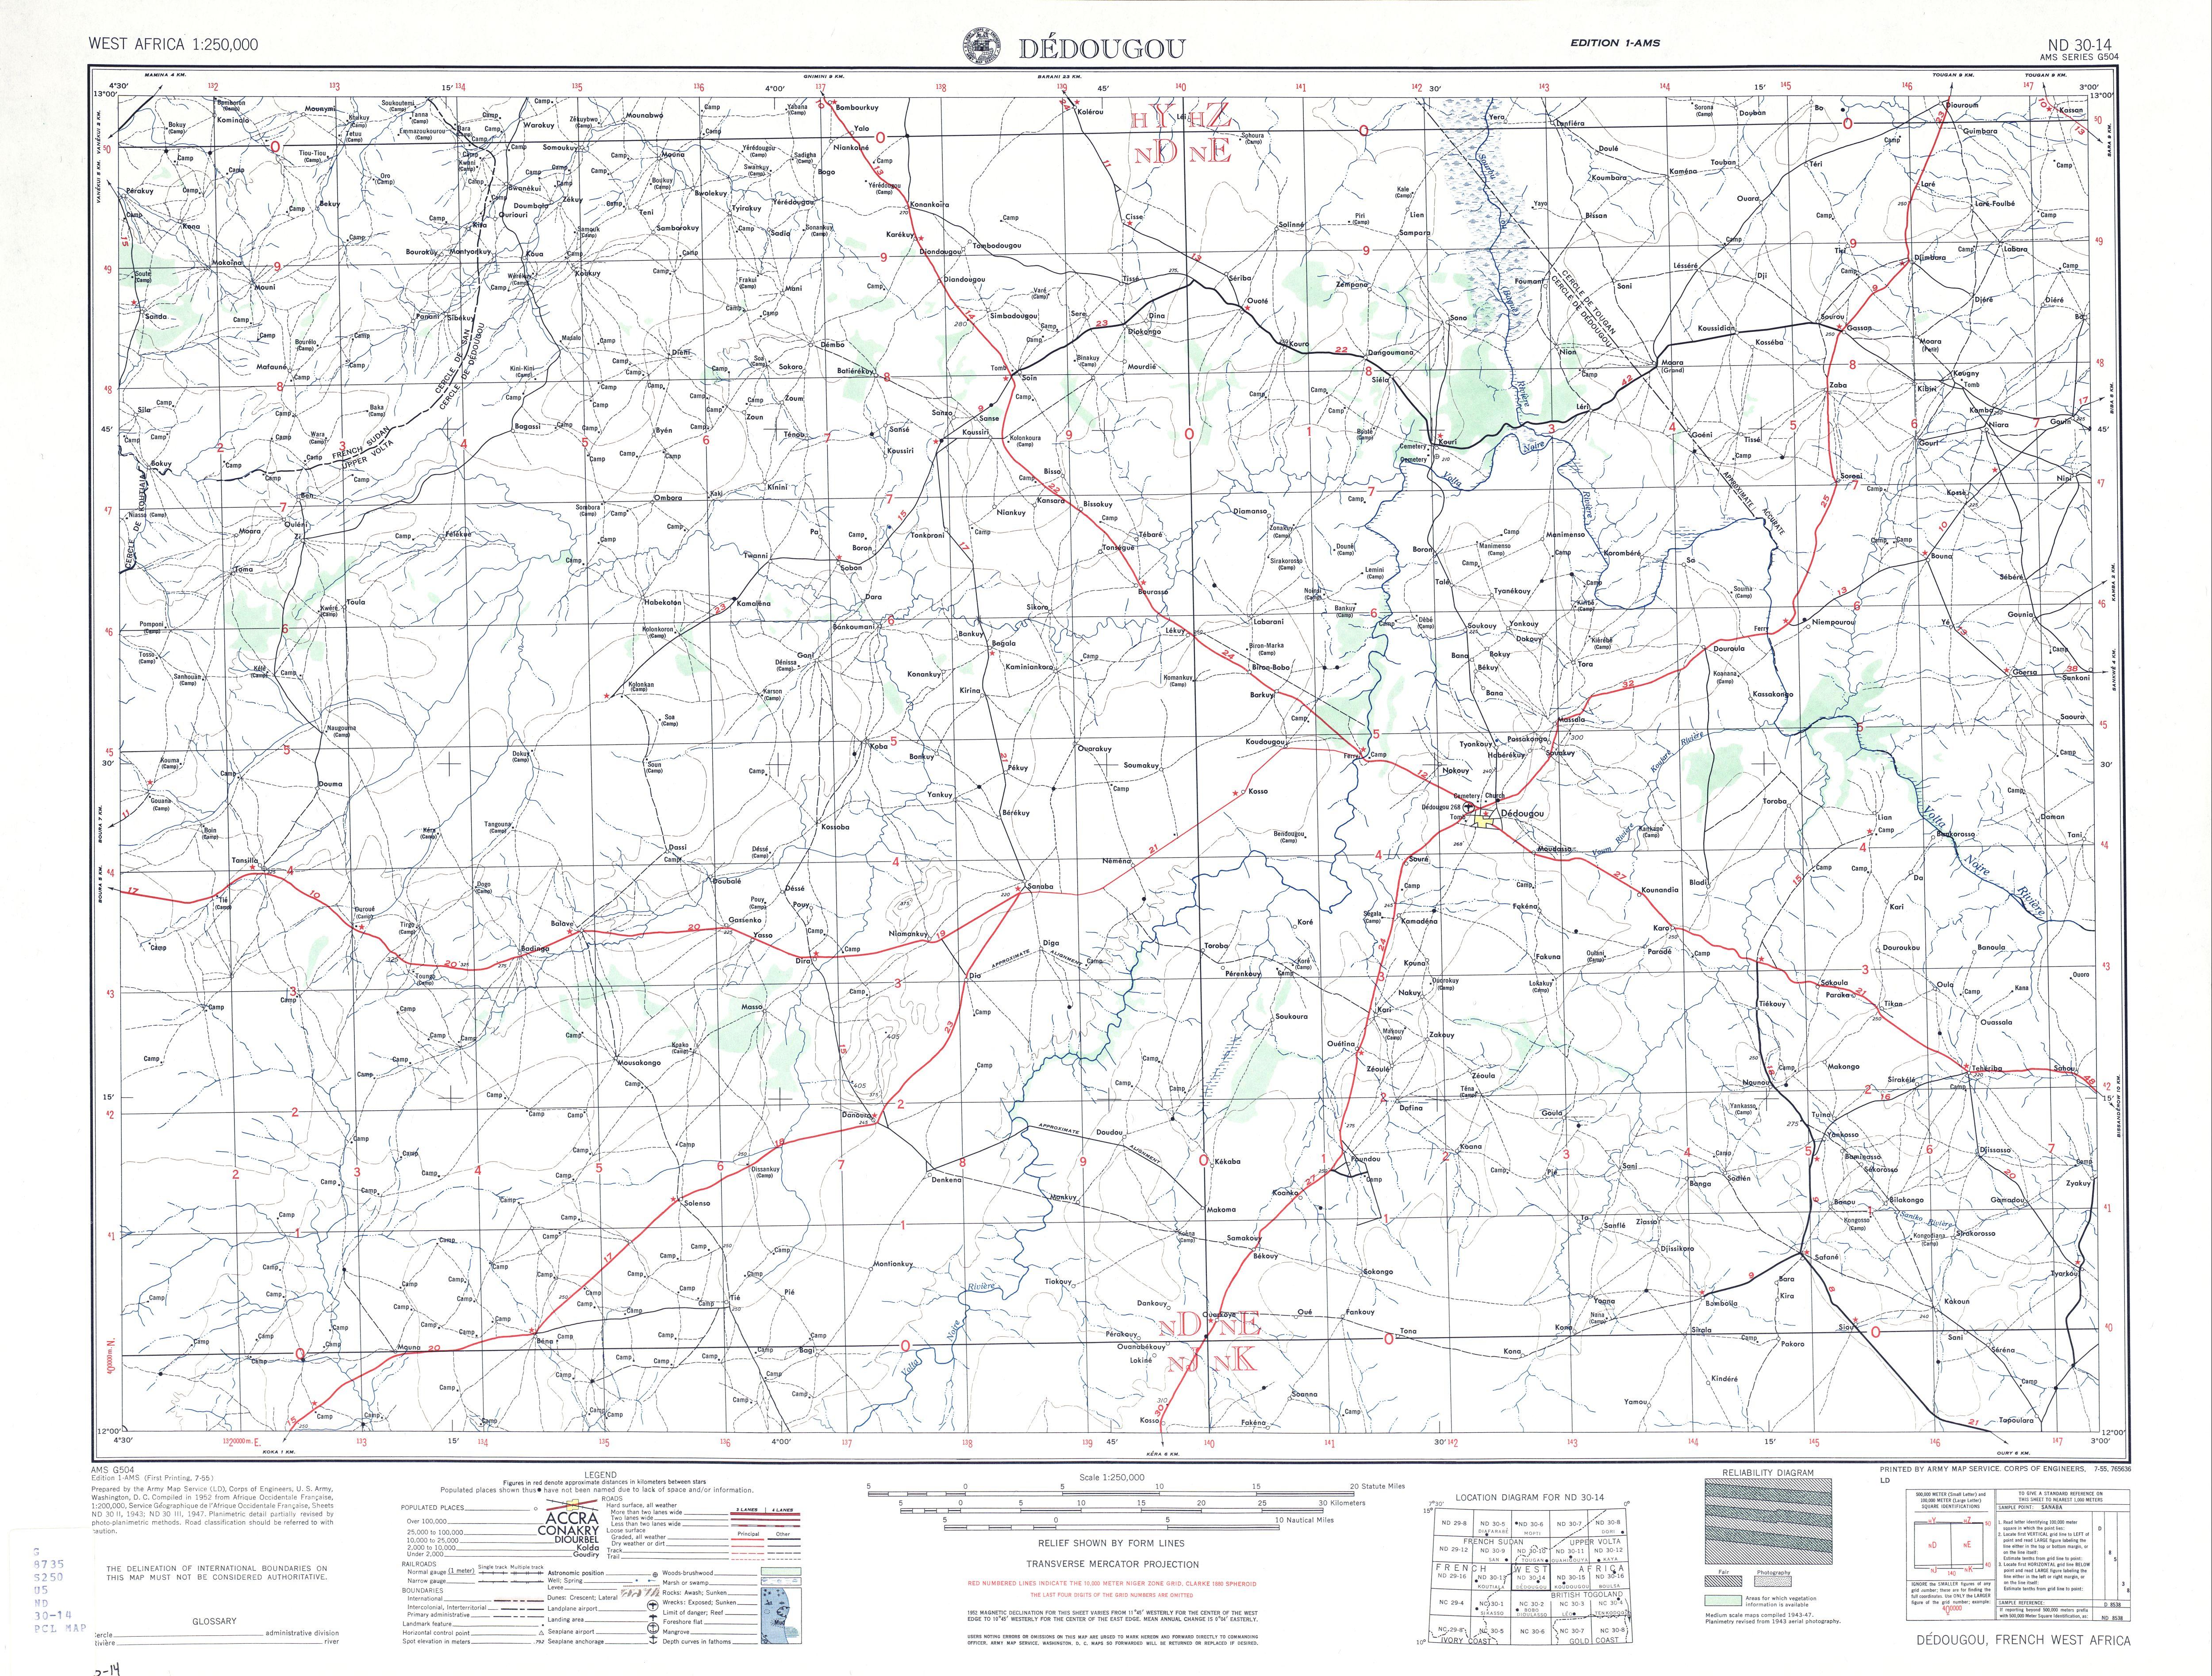 Hoja Dedougou del Mapa Topográfico de África Occidental 1955